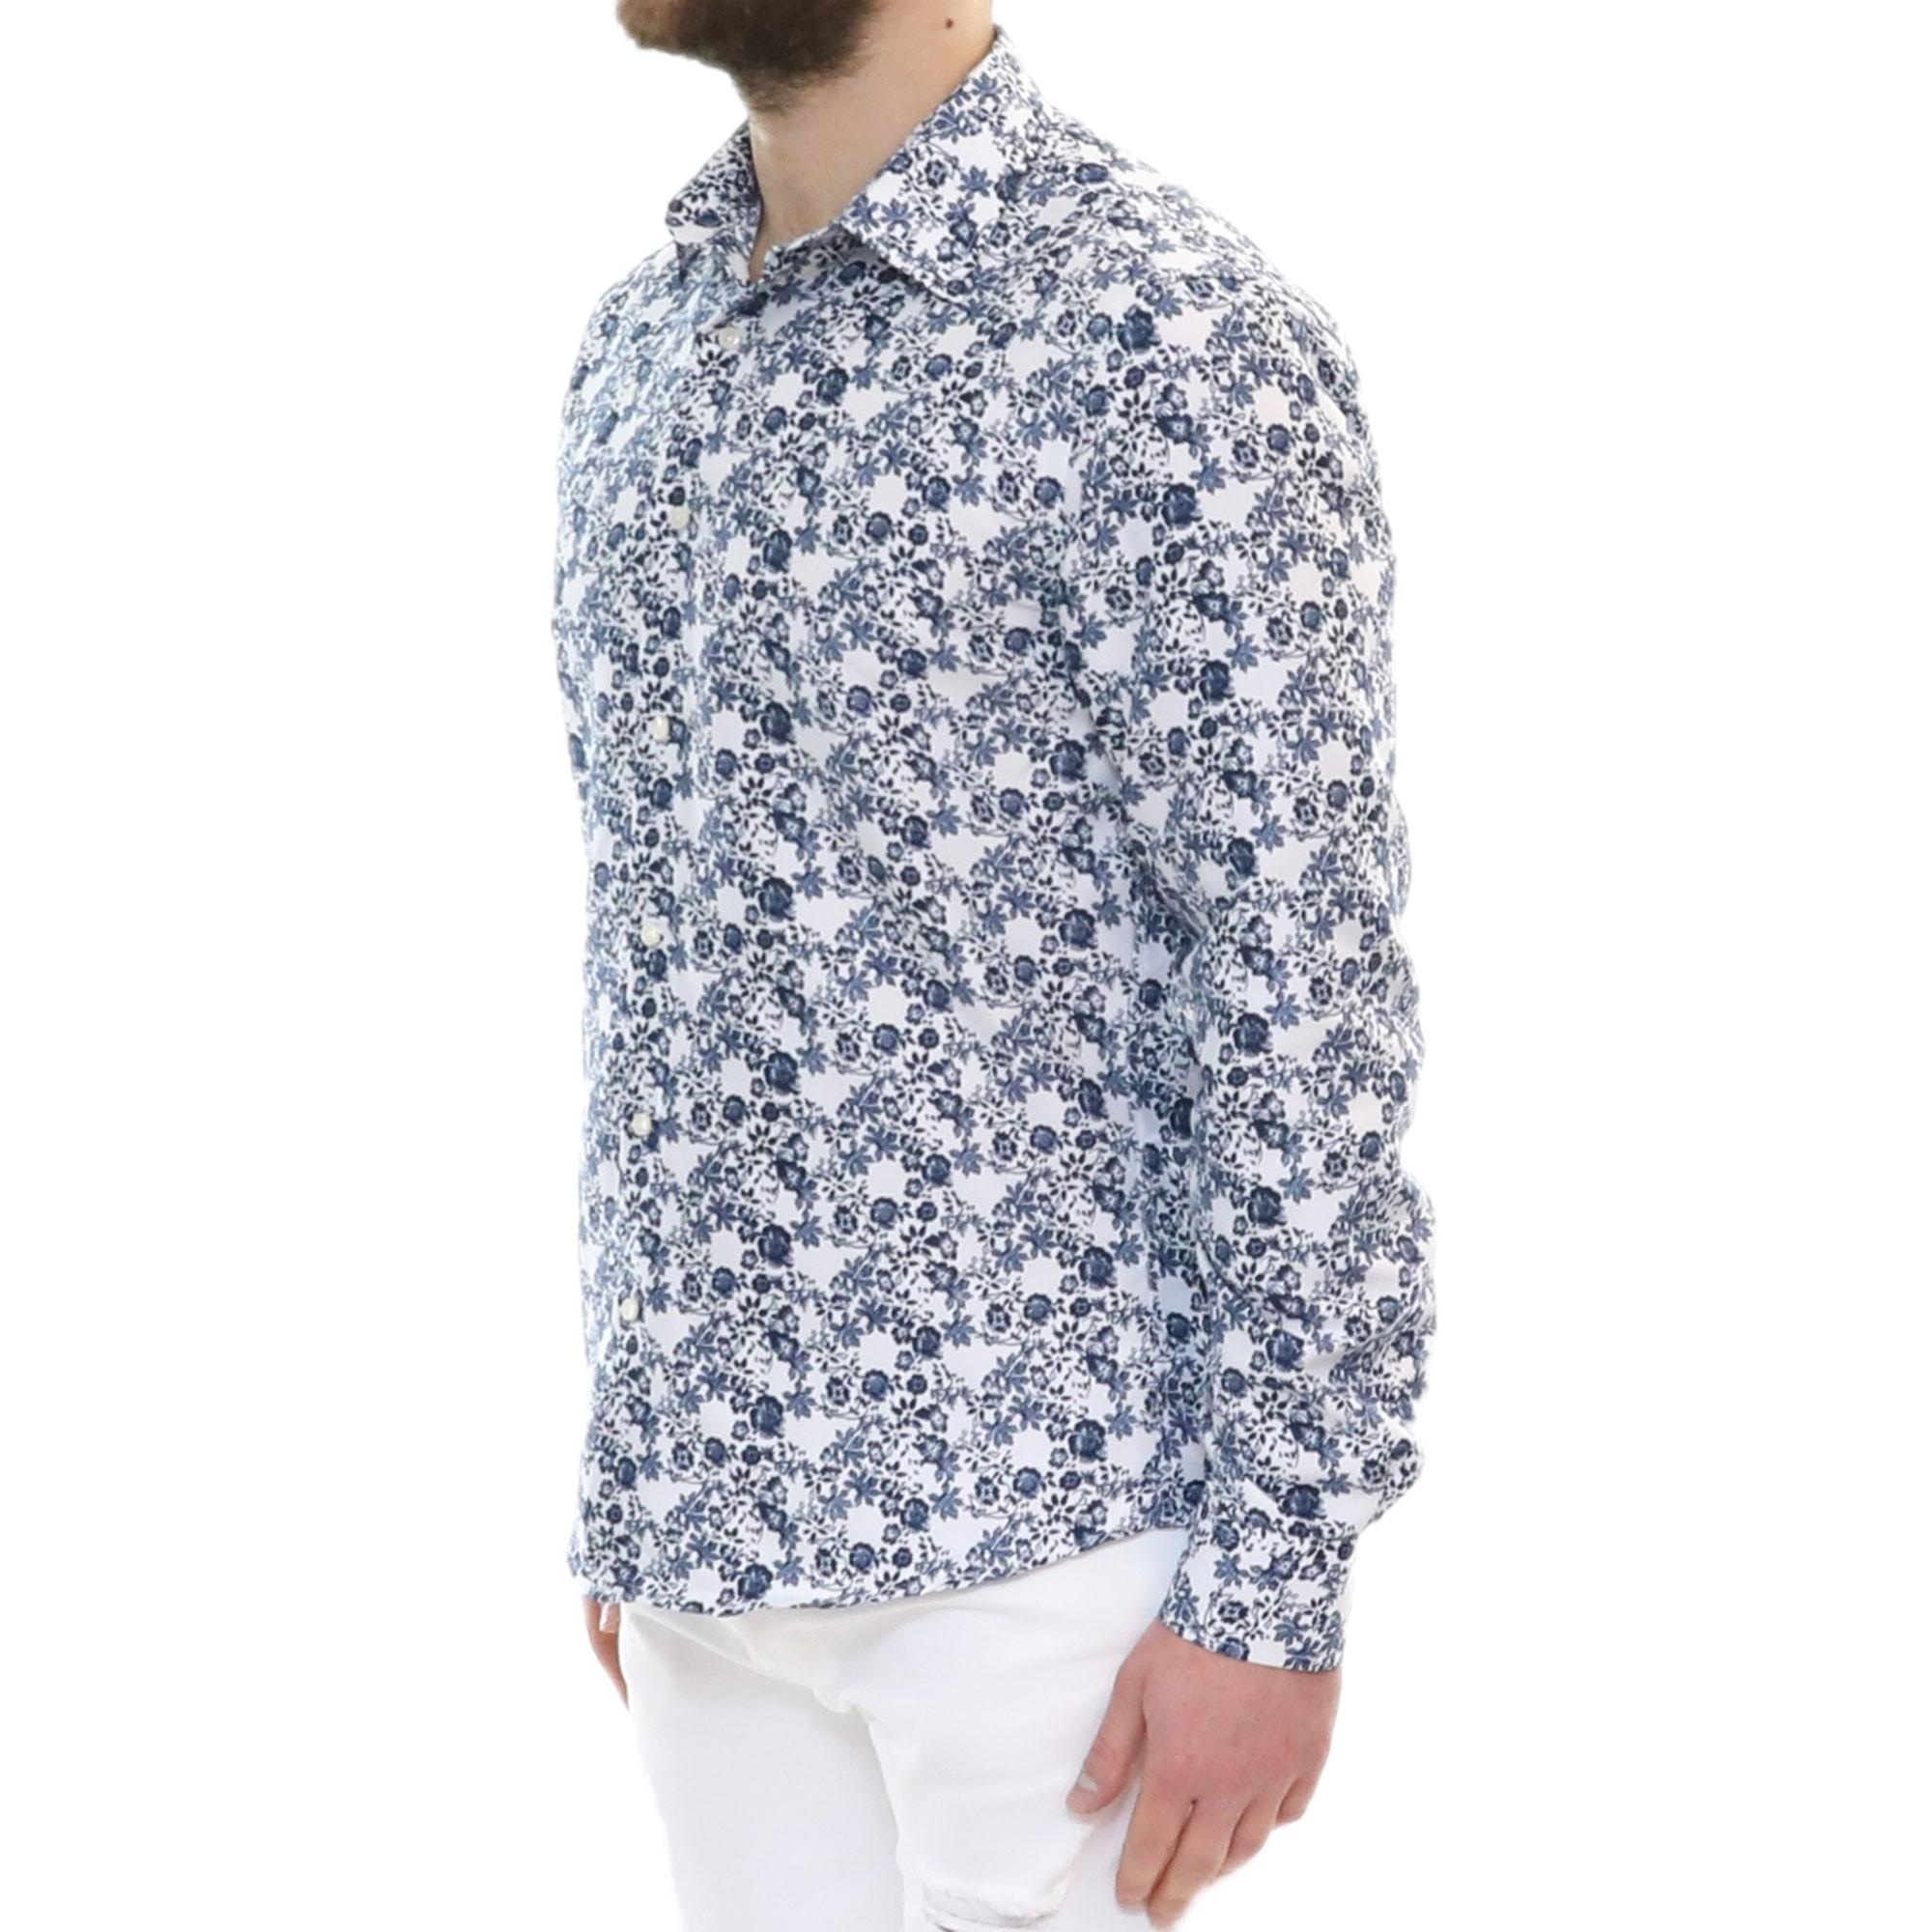 Camicia-Uomo-Cotone-Fiori-Slim-Manica-Lunga-Fantasia-Floreale-S-M-L-XL-XXL miniatura 15